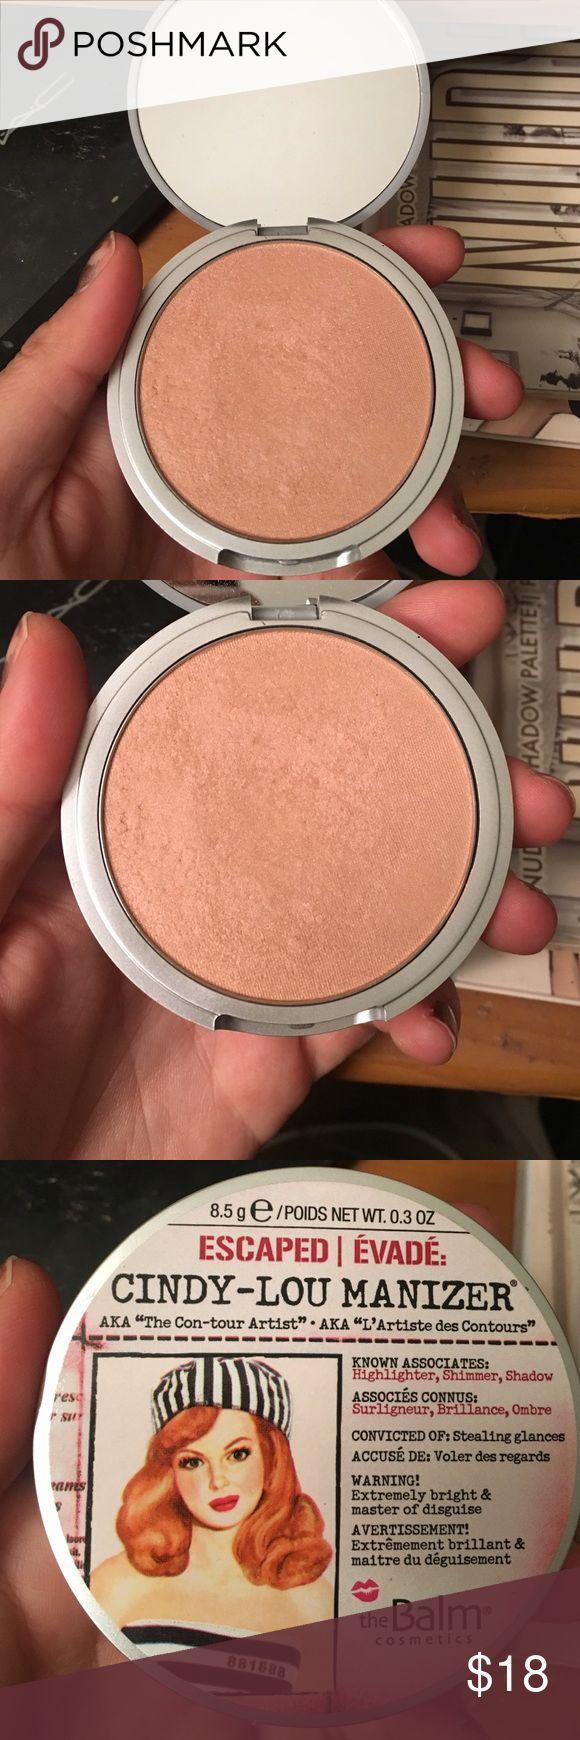 The Balm Cindy-Lou-Manizer face highlight powder Barely used highlight powder from the balm cosmetics. Slightly pink shimmery highlight. Makeup Luminizer